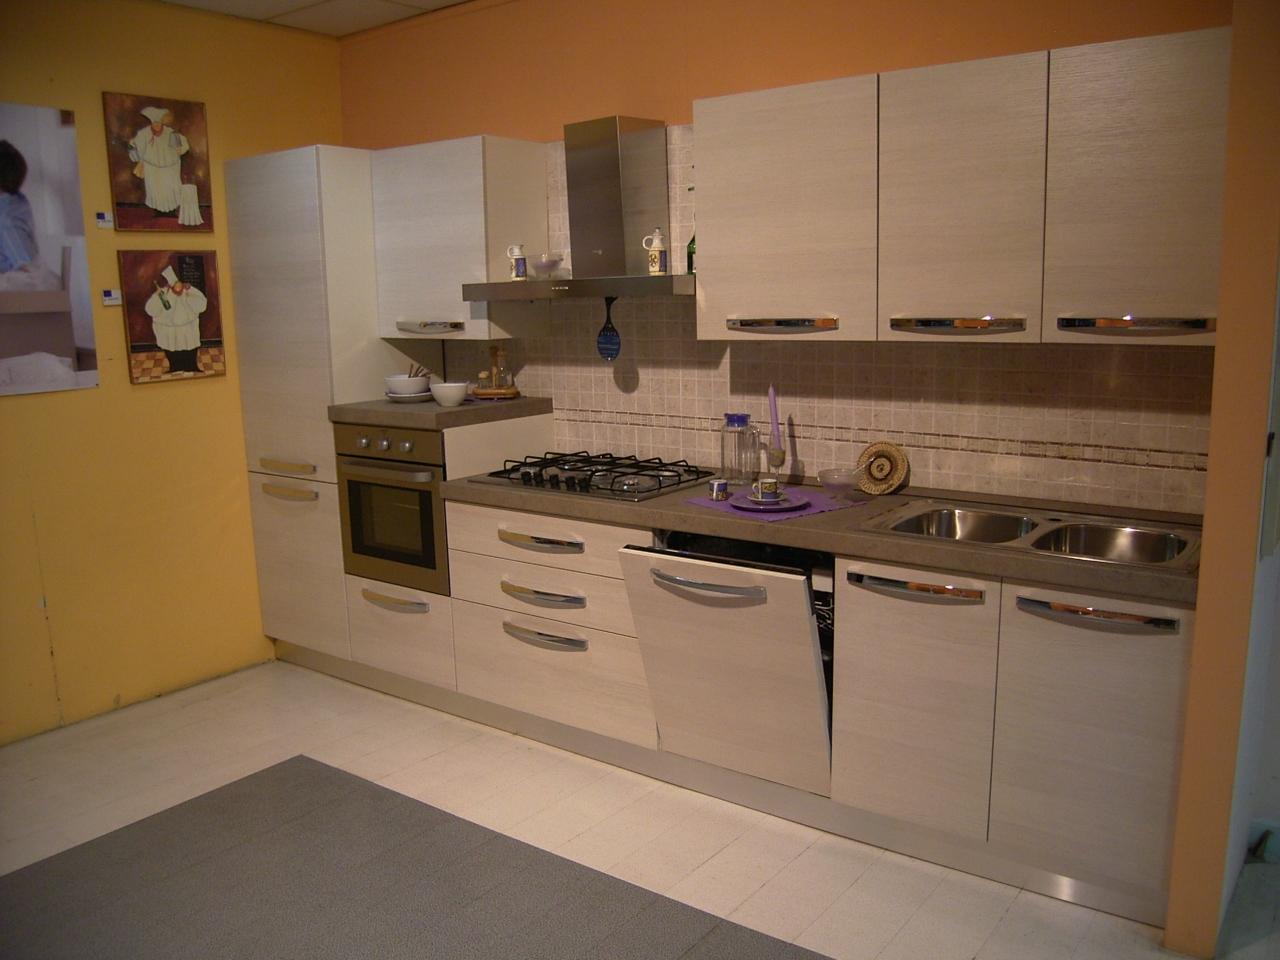 cucina scontata mobilturi